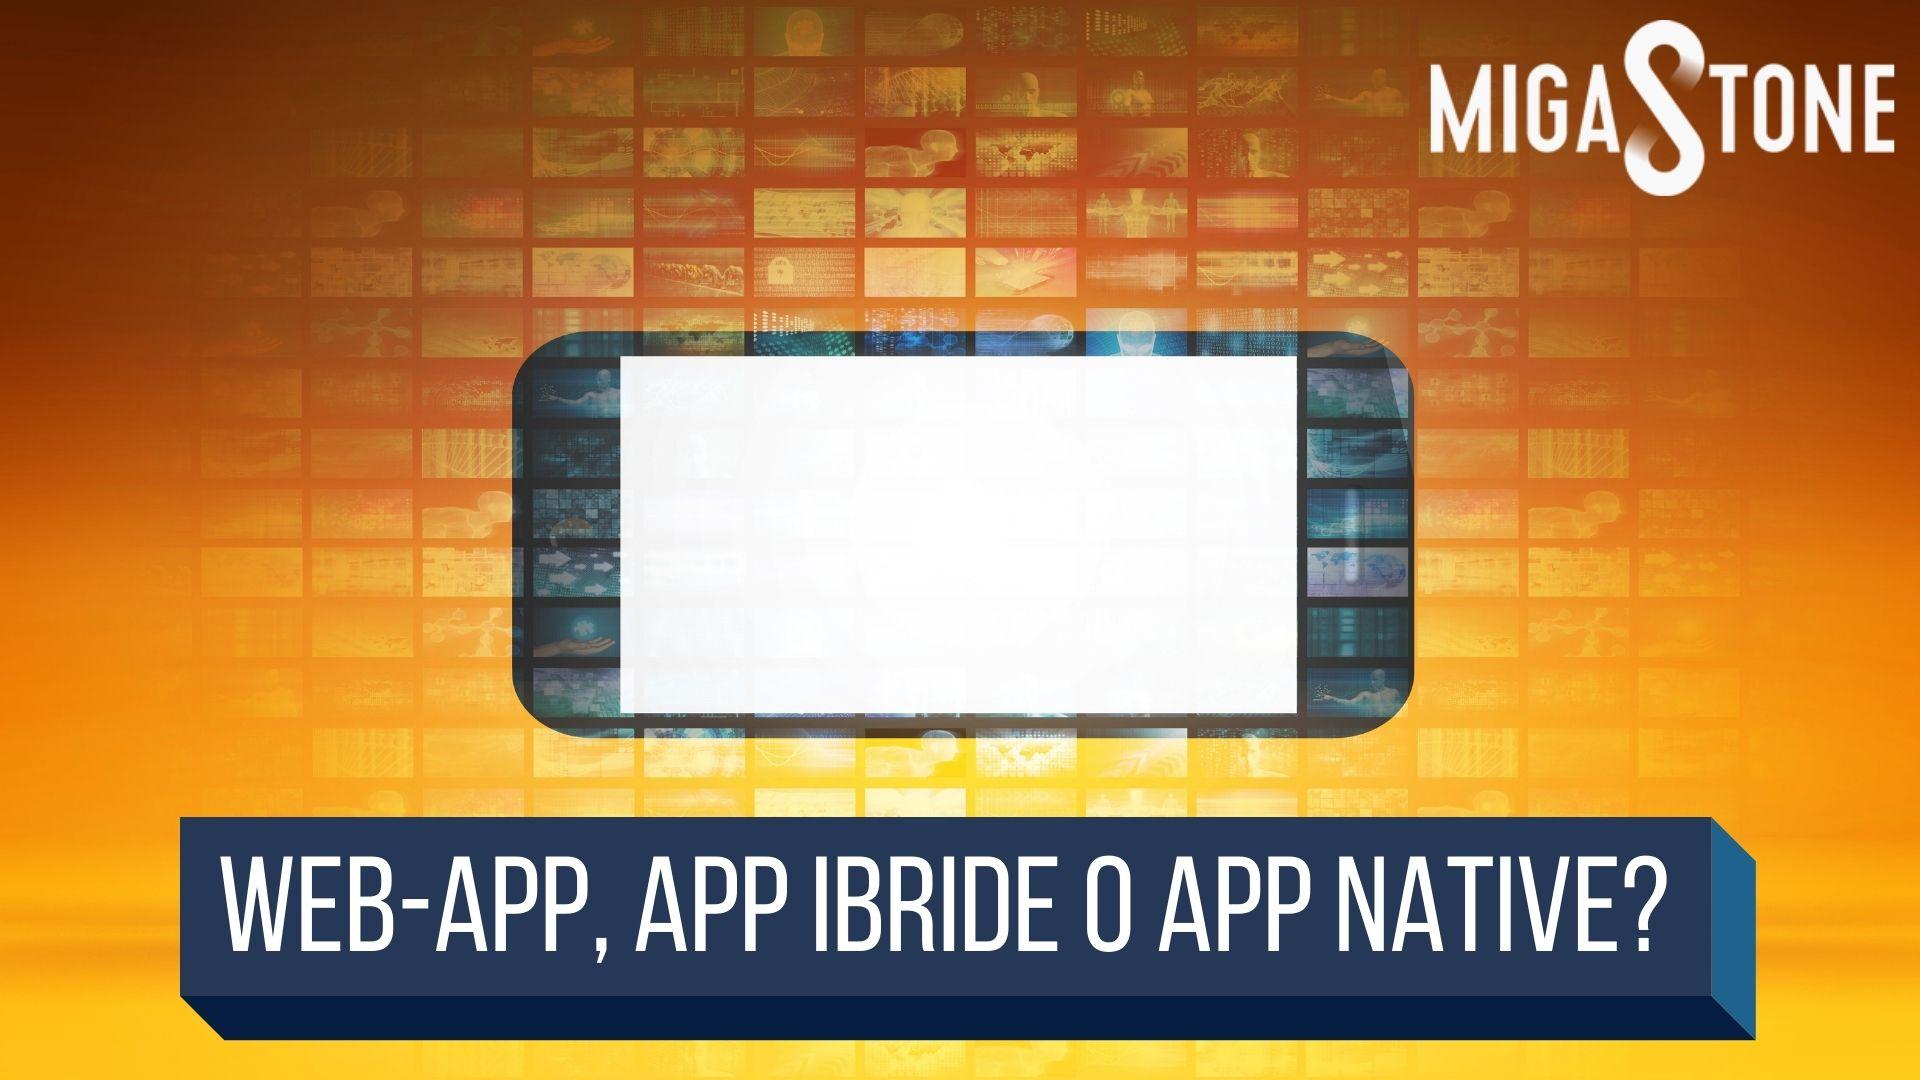 , Web-App, App ibride o App native?, Migastone Blog